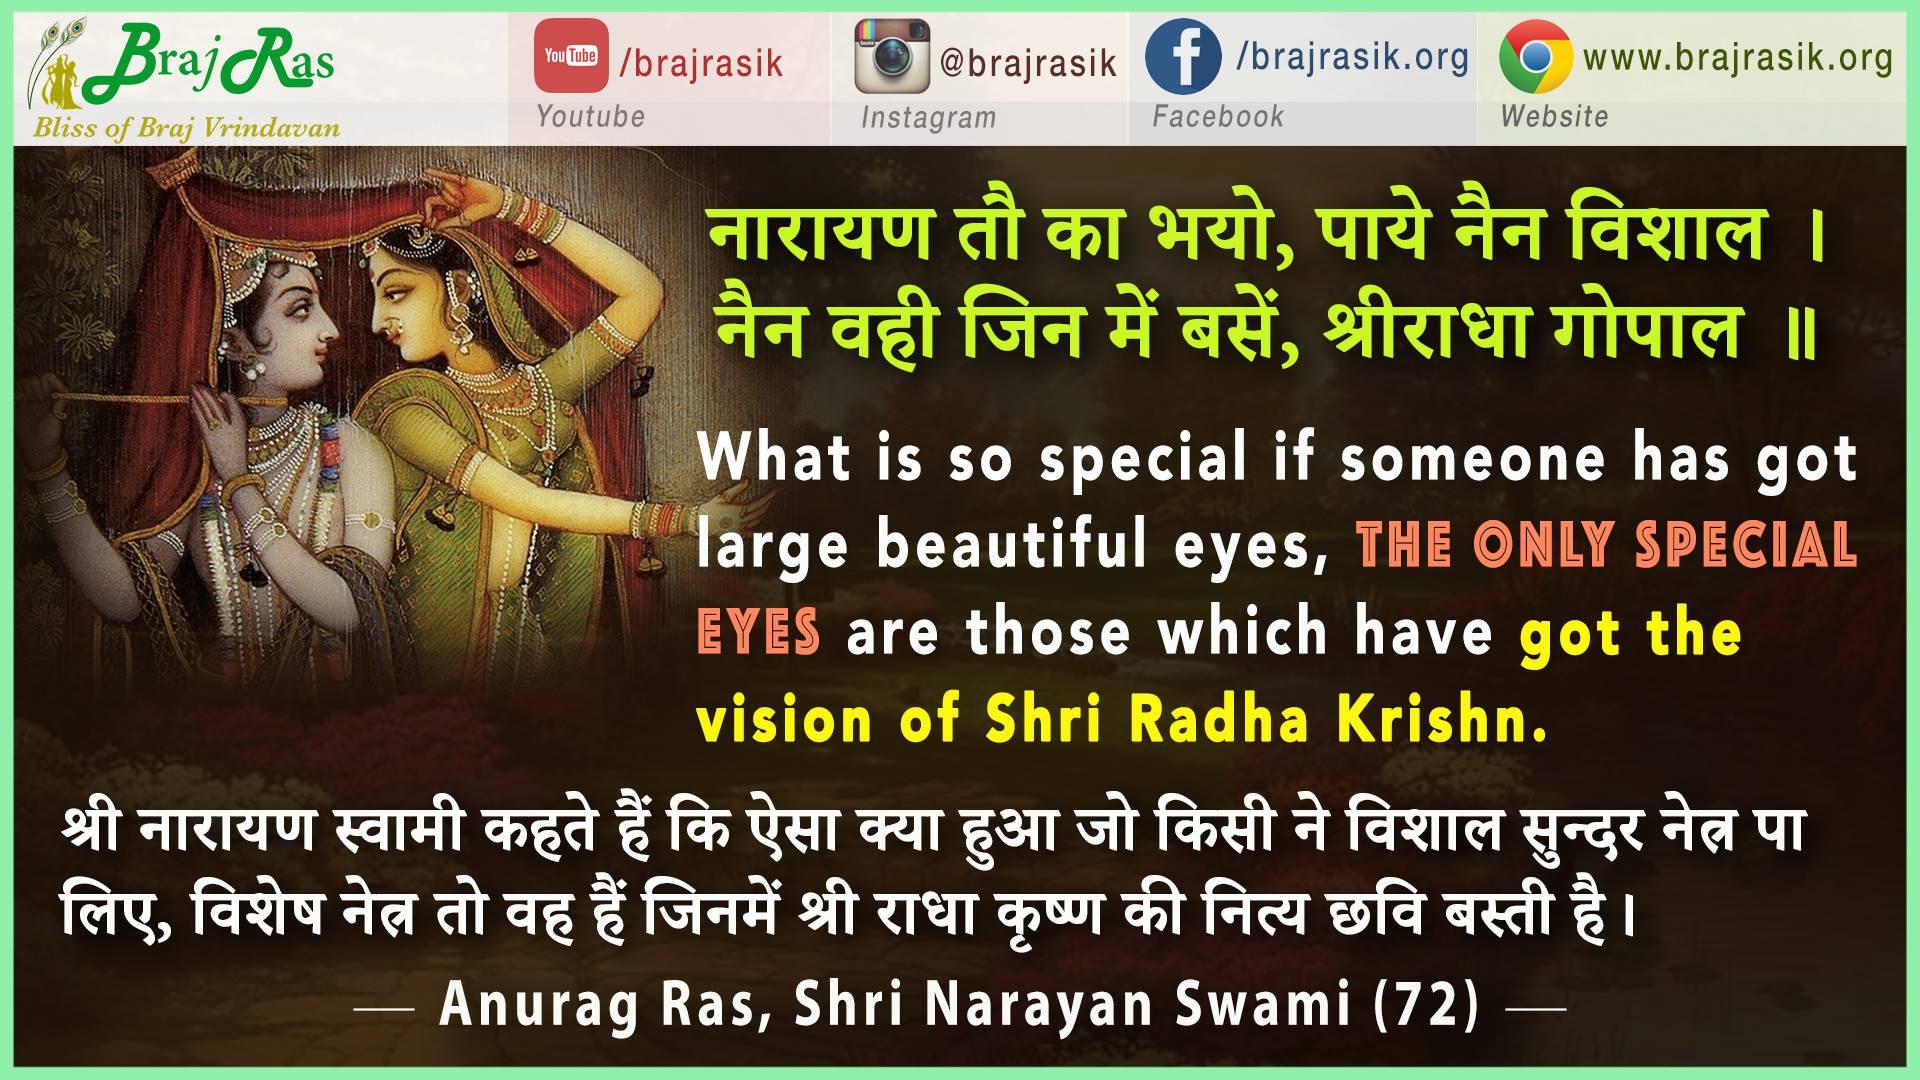 Narayan To Ka Bhayo, Paye Nain Vishaal - Anurag Ras, Shri Narayan Swami (72)